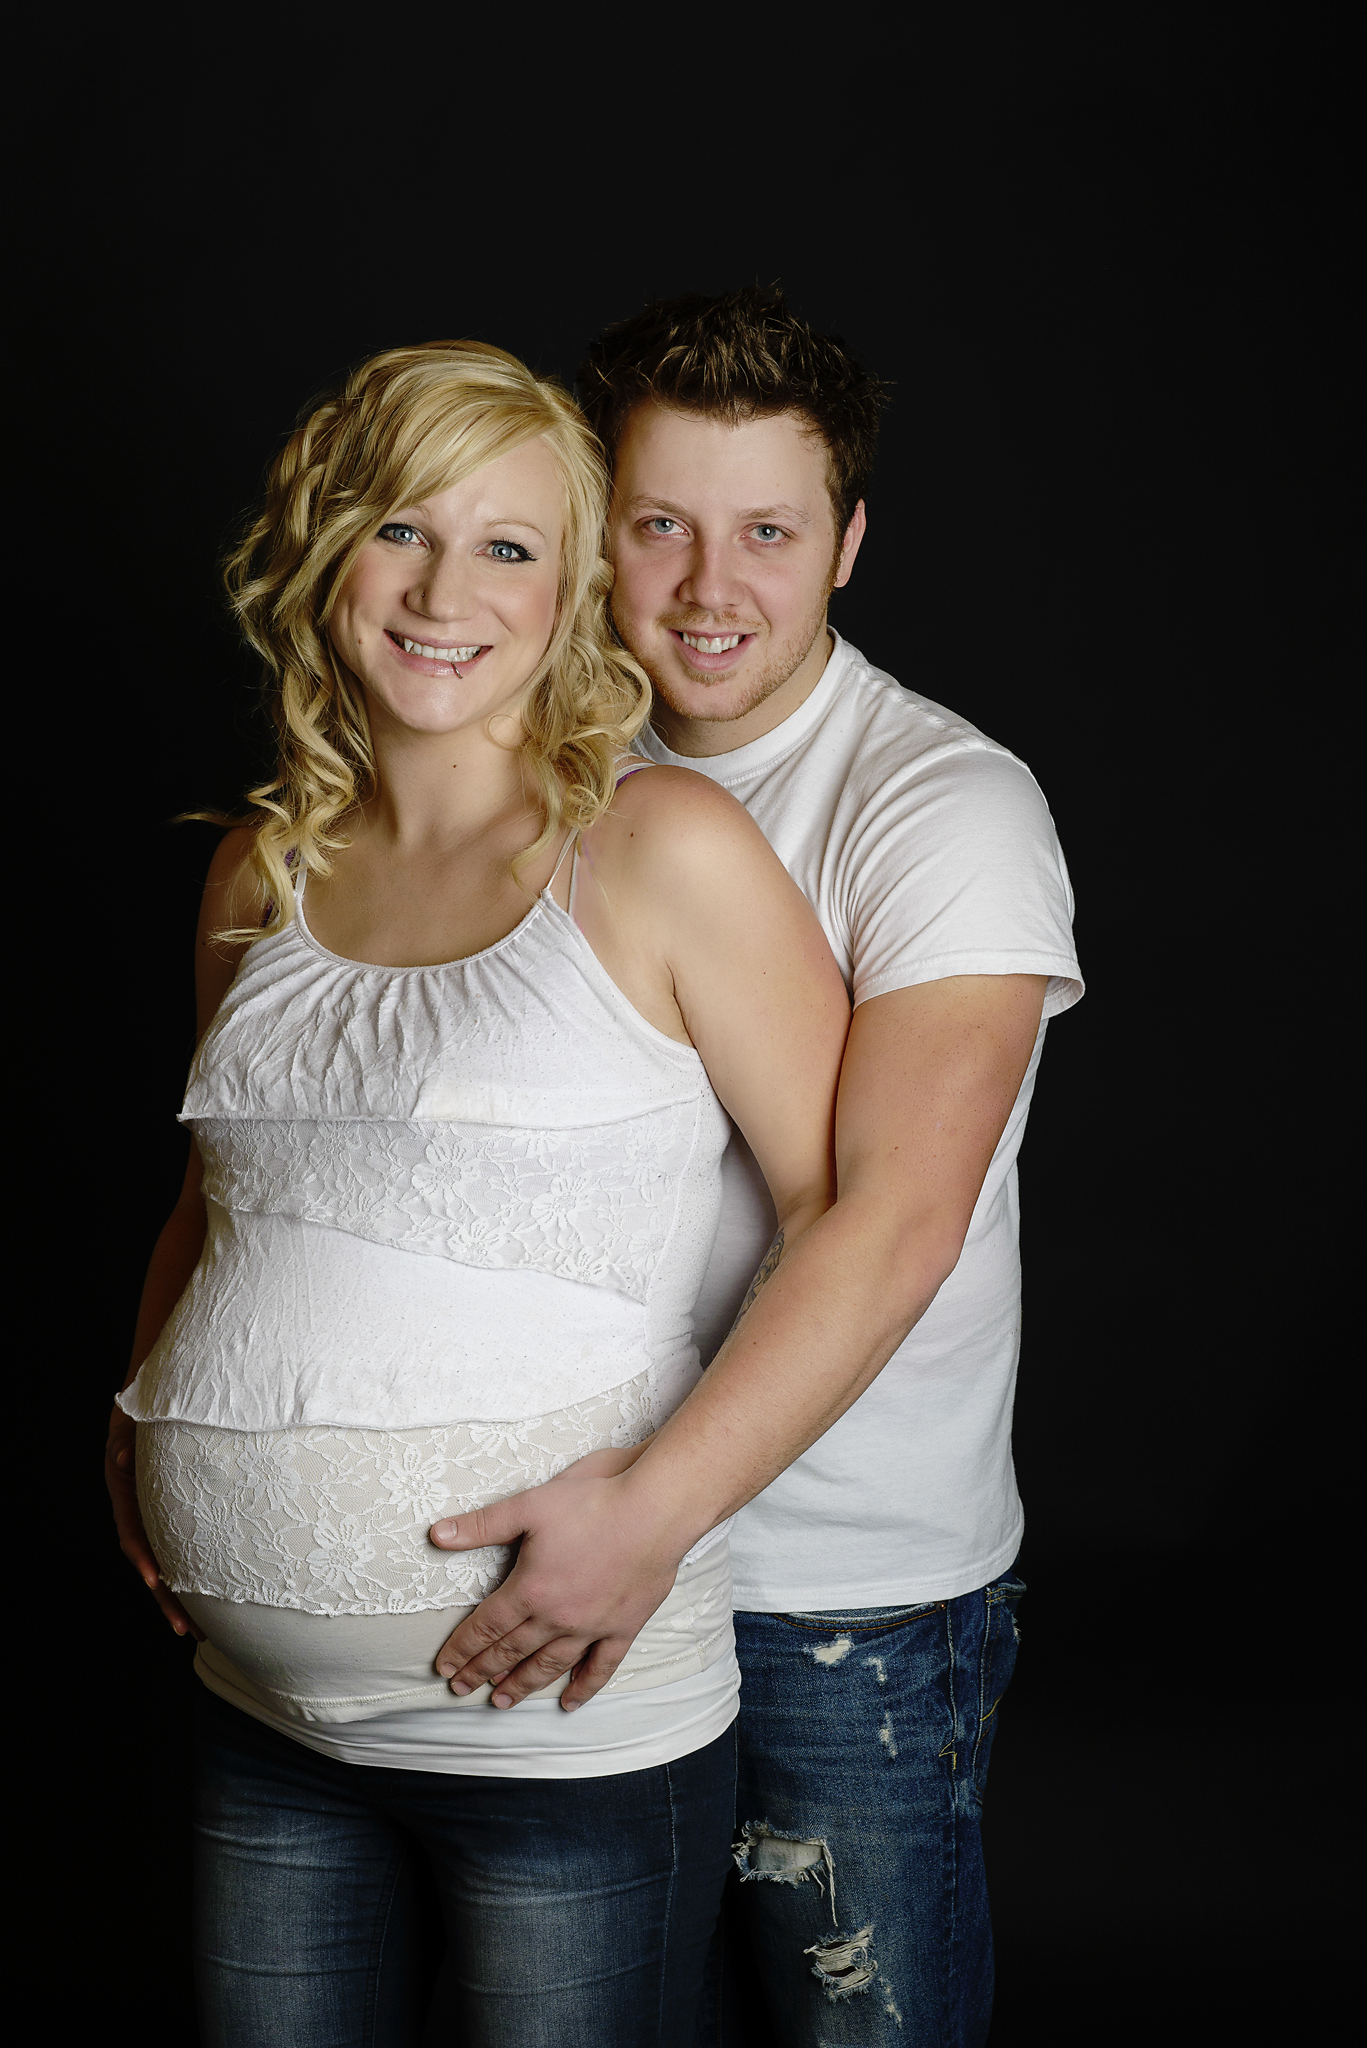 Saskatoon-Newborn-Family-Renditure-Photography-Photographer-Maternity-Pregnancy-Saskatchewan-542FBR.jpg